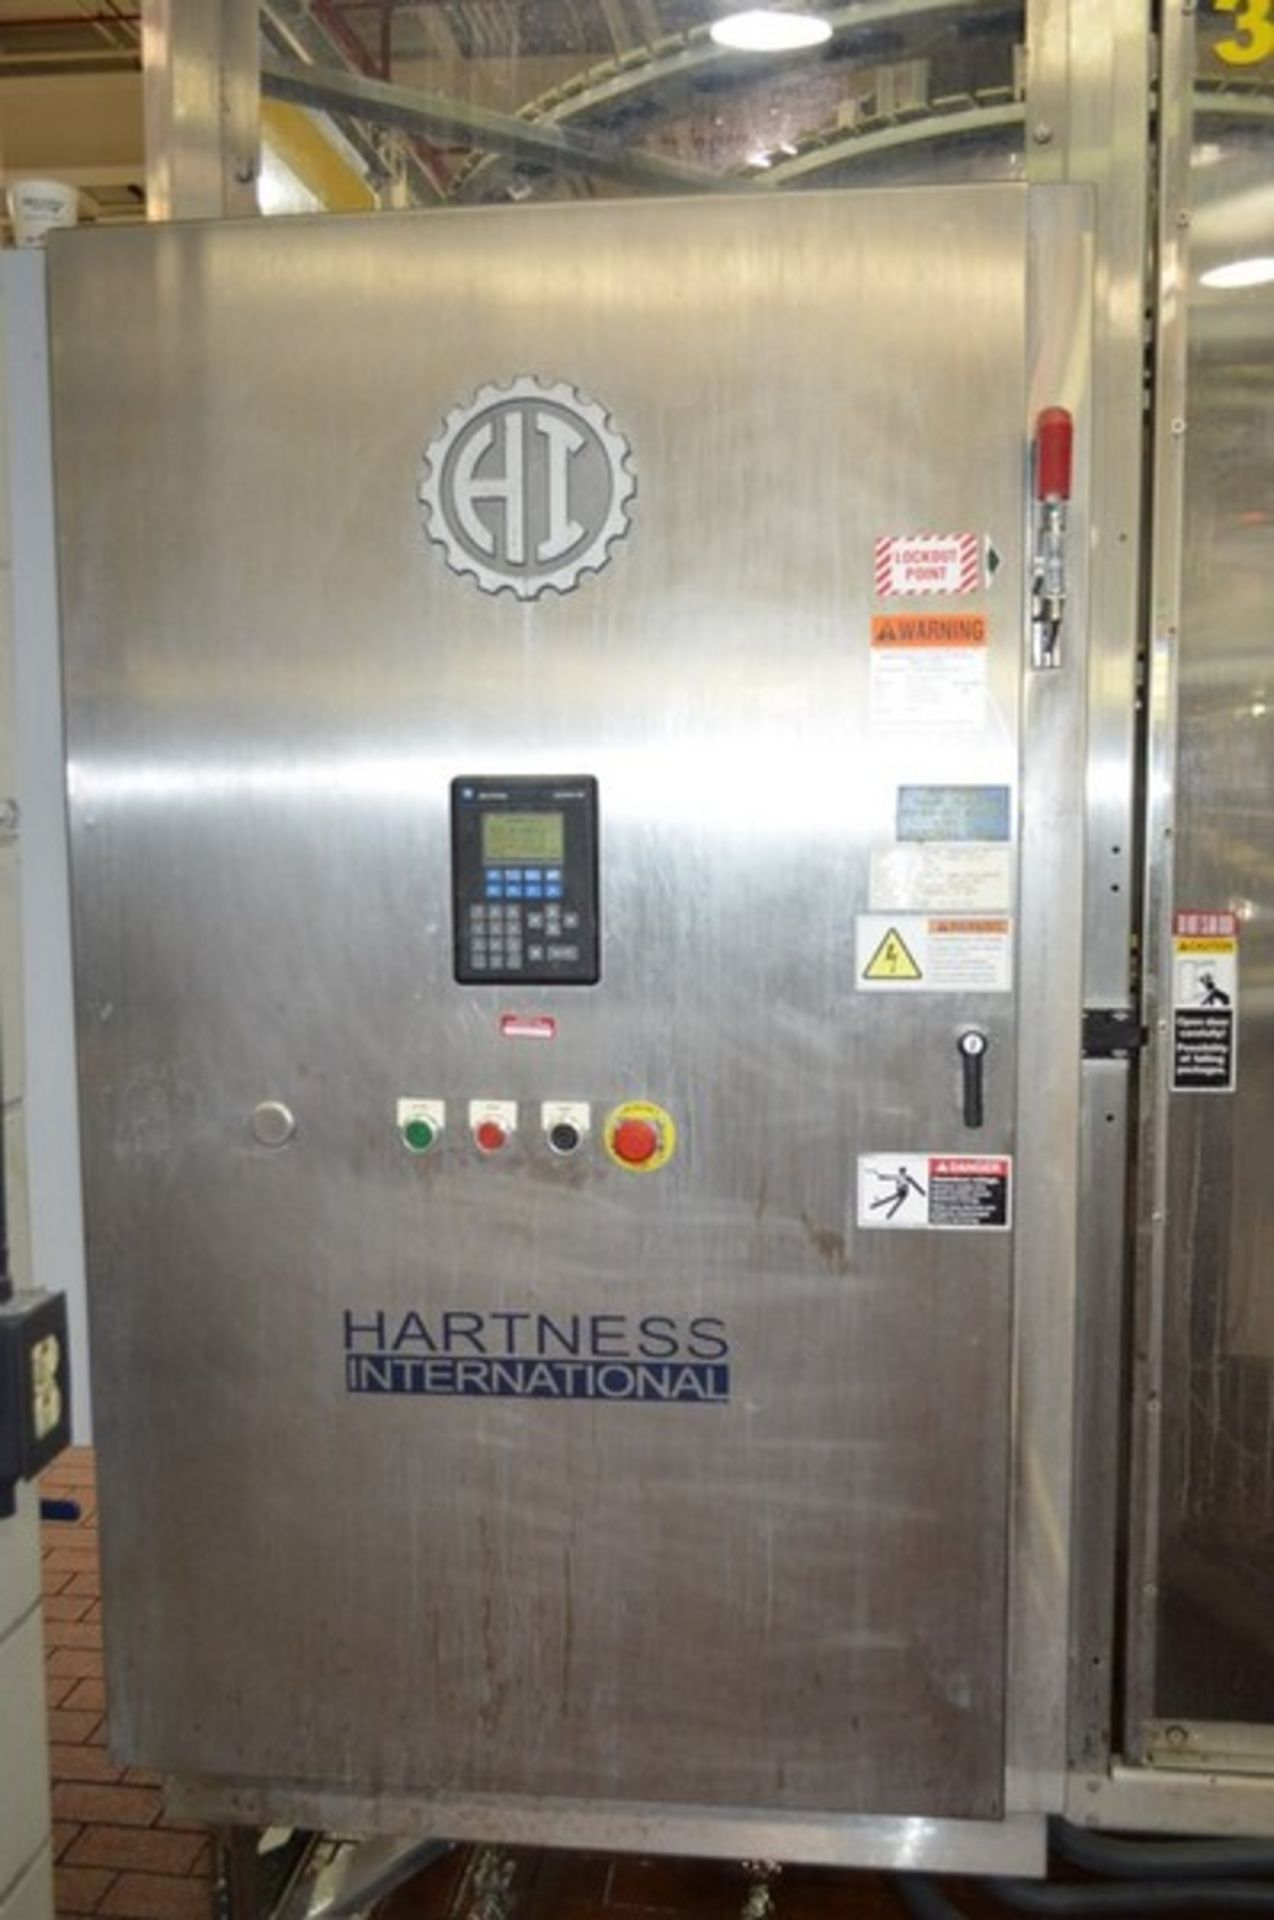 Lot 49 - Hartness Dynac 6400 Spiral Accumulator